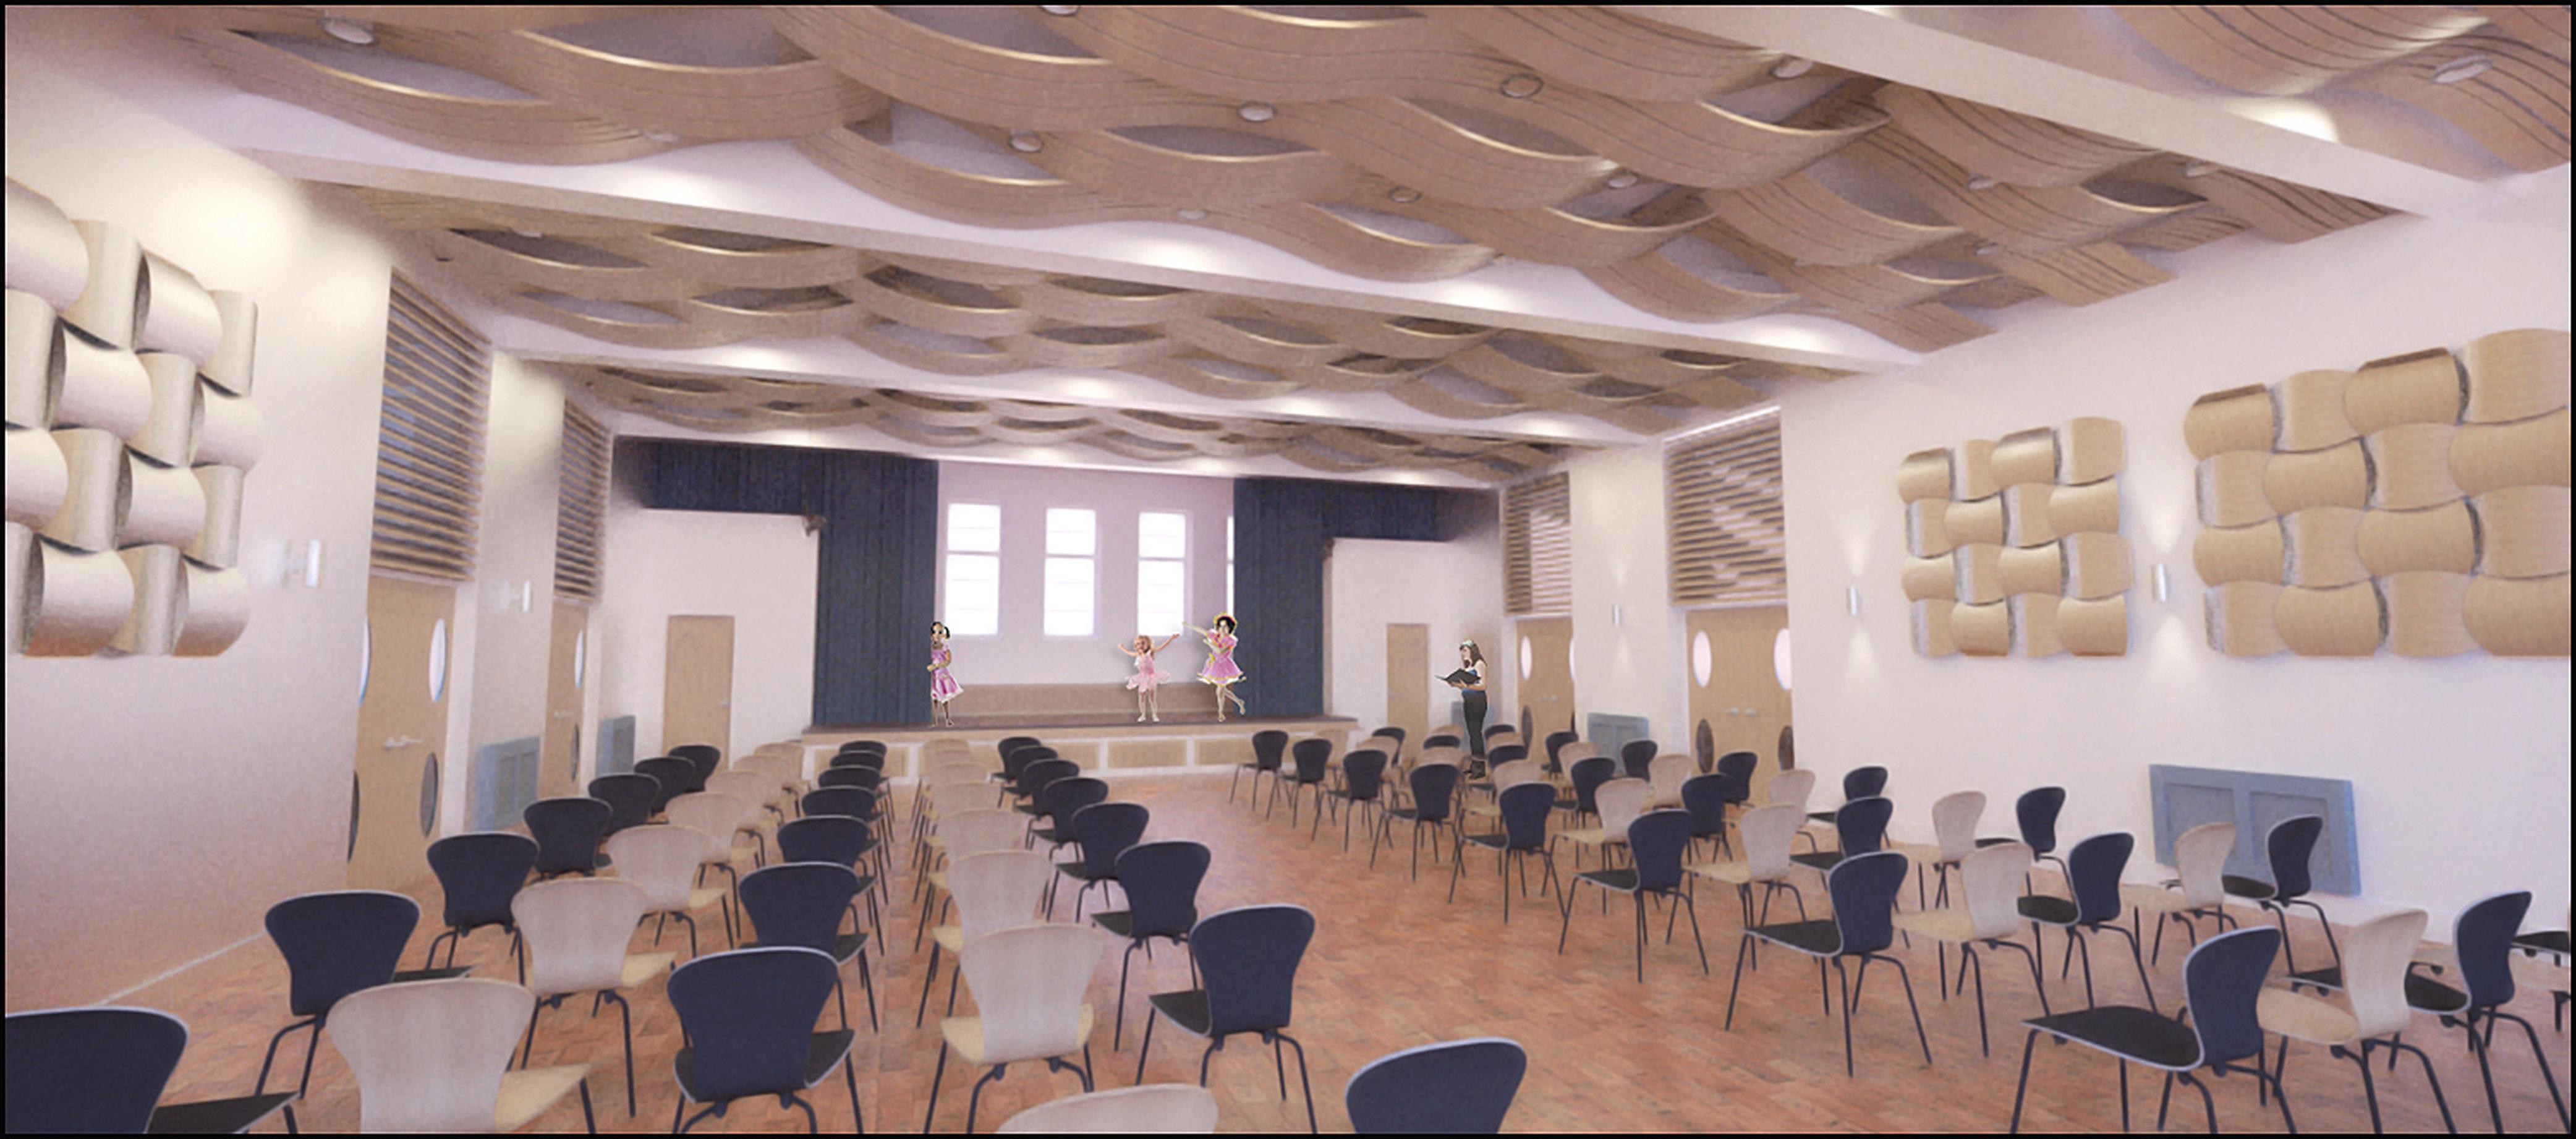 Proposed+CGI+-+Sandhurst+Assembly+Hall+FUTURE+DEVELOPMENT+EDITED.jpg